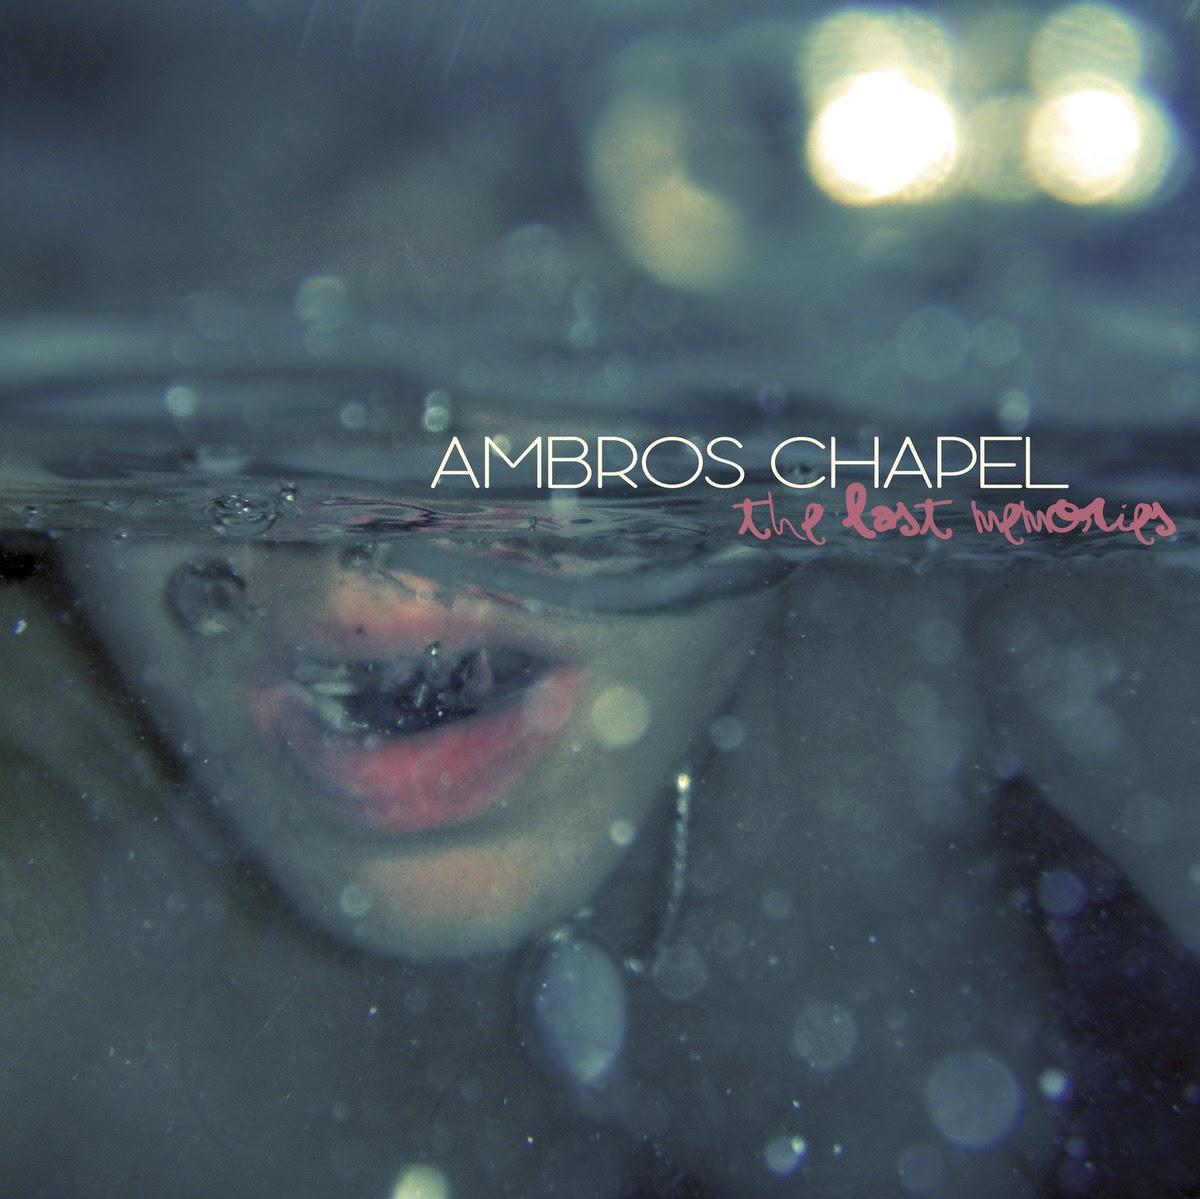 AMBROS CHAPEL - (2014) The last memories